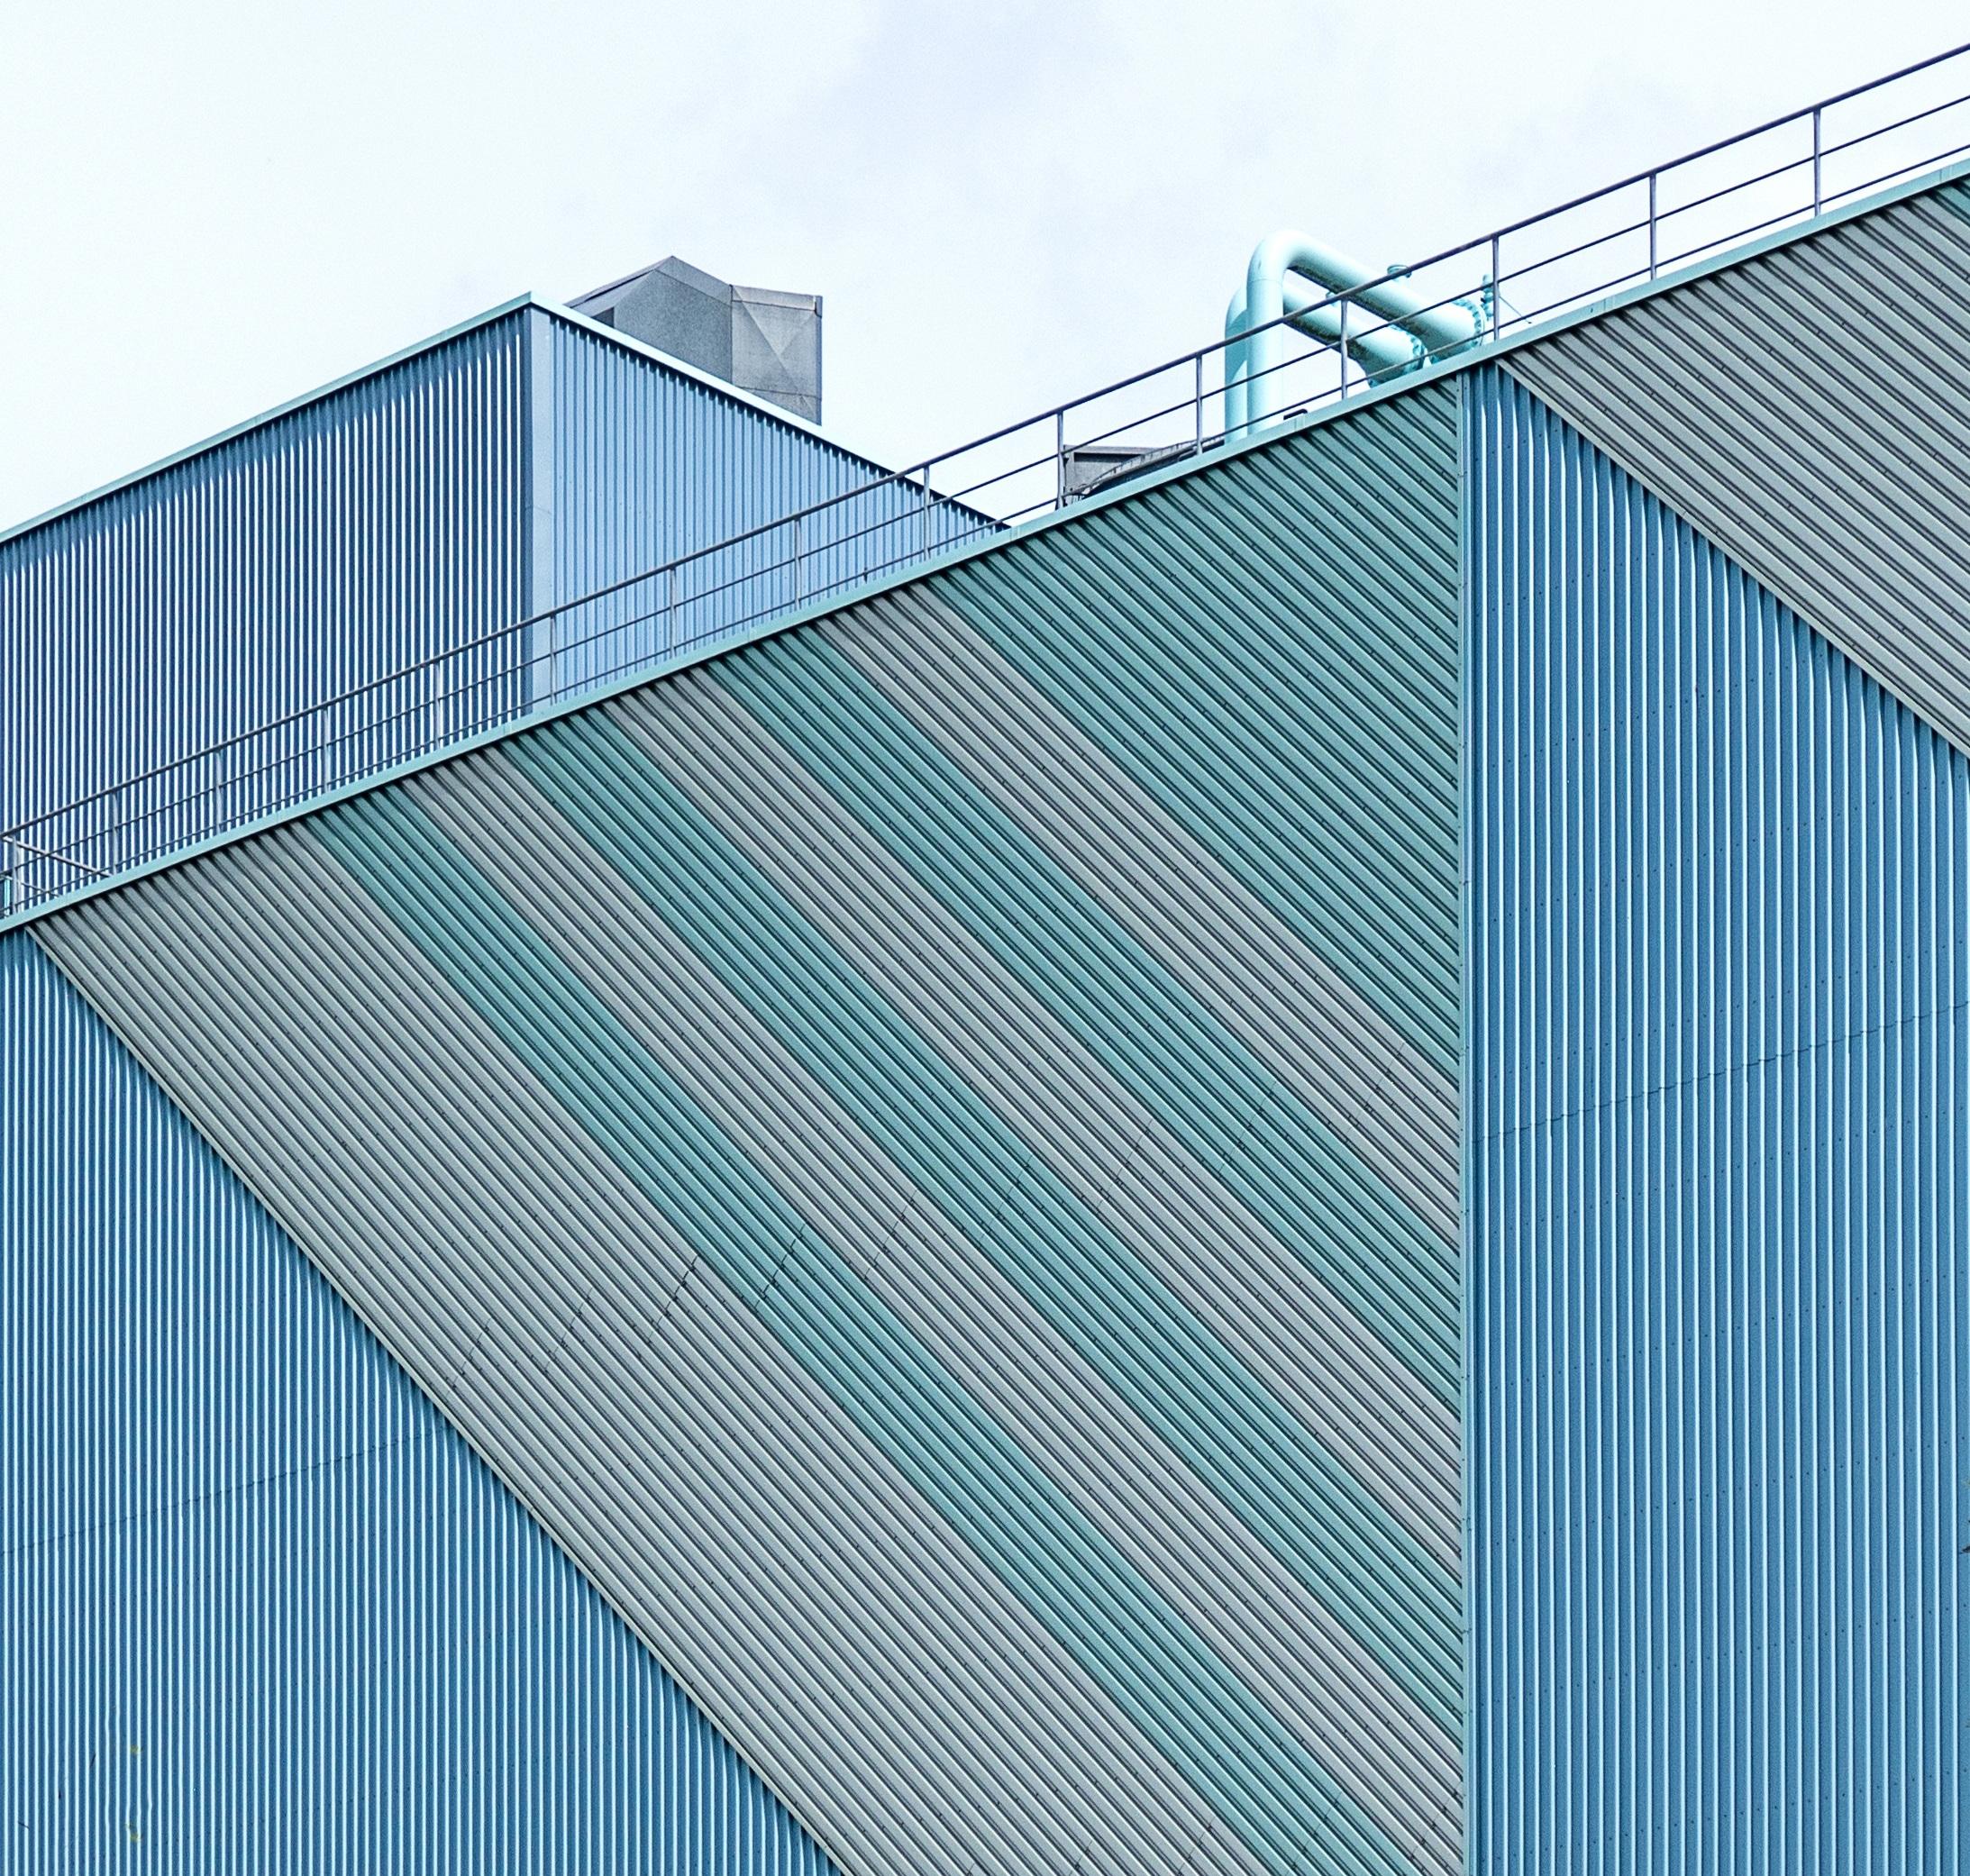 Wall Cladding & Aluminium Fascias